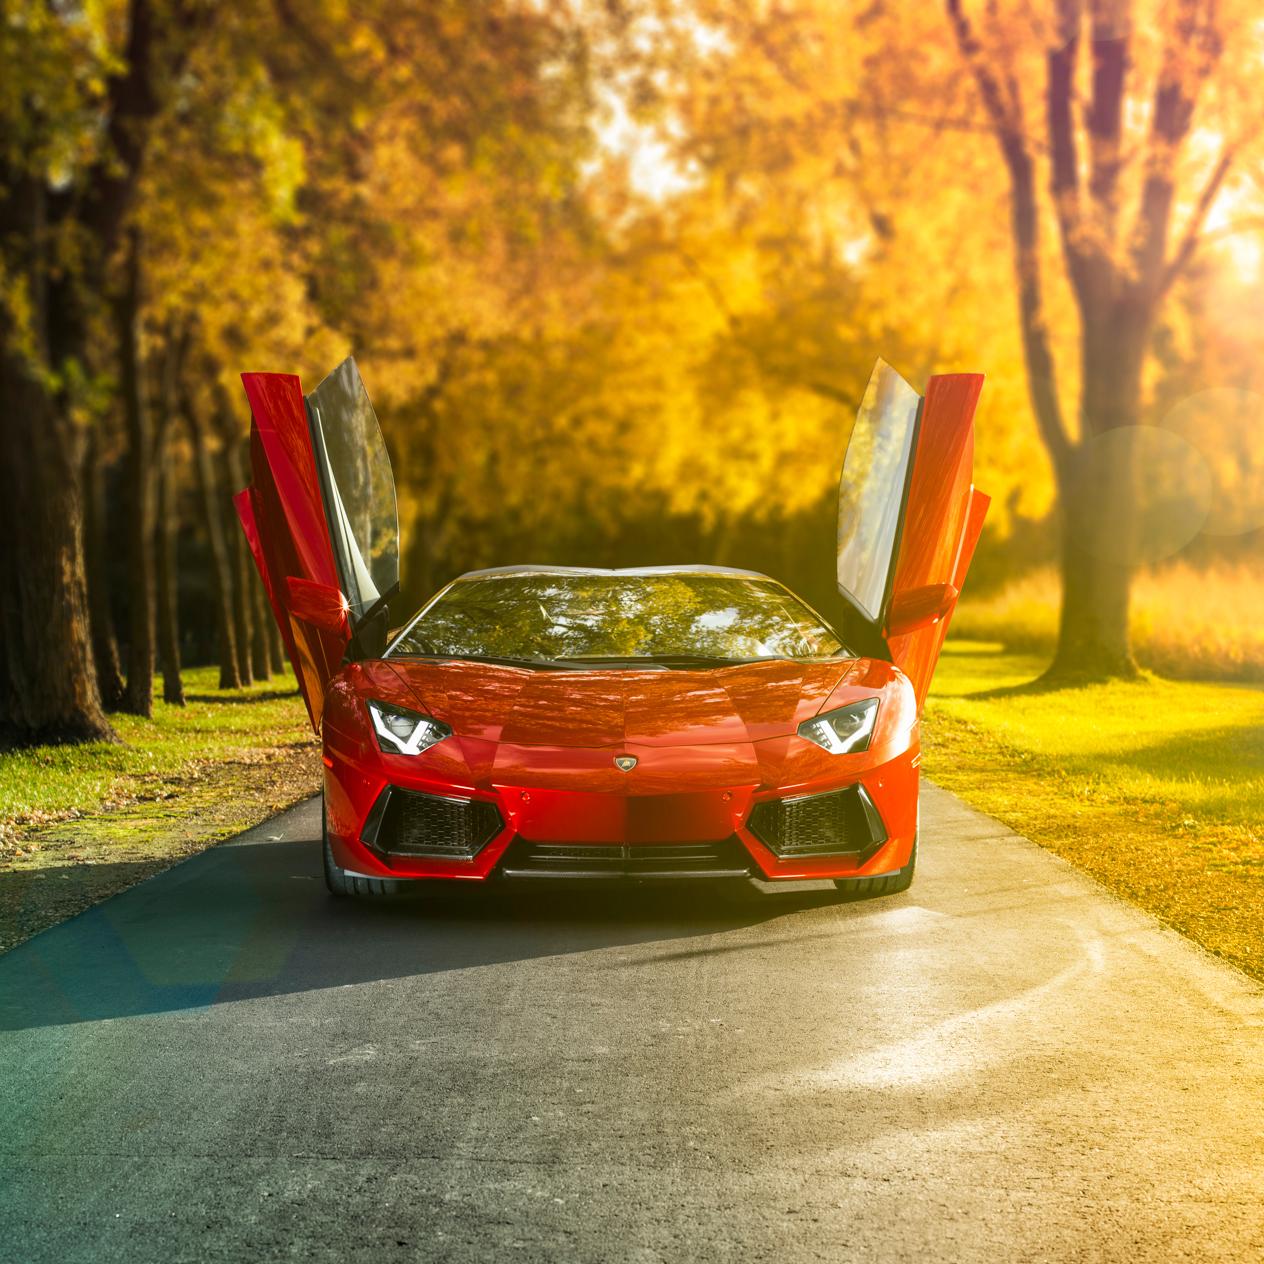 Dynamic Photowerks 187 Professional Automotive Photography